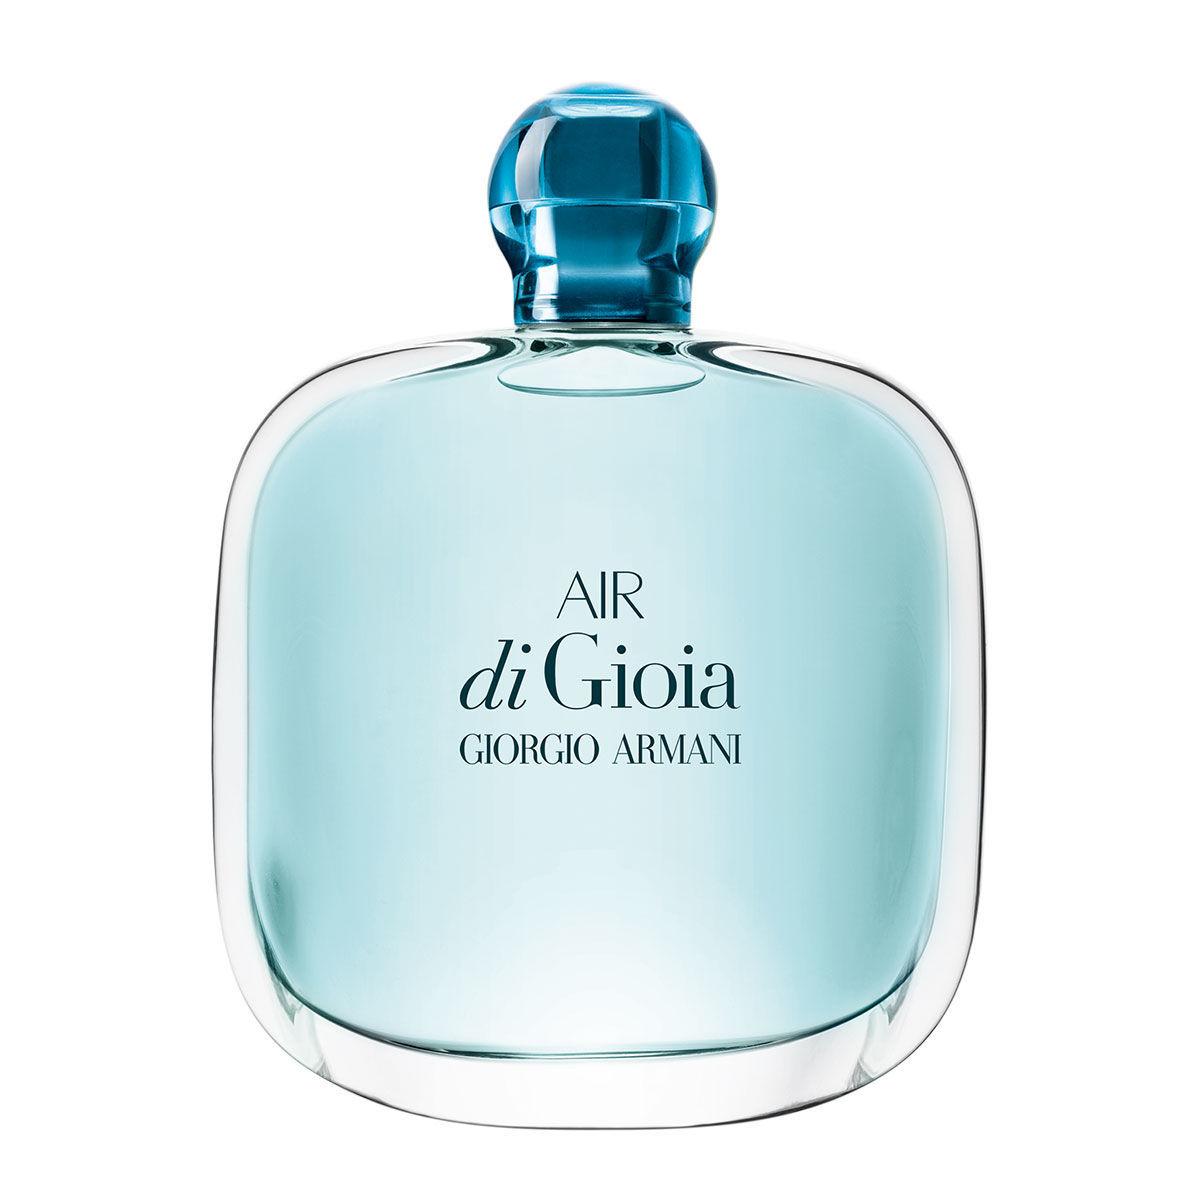 Giorgio Armani Air di gioia eau de parfum 100 ml vapo